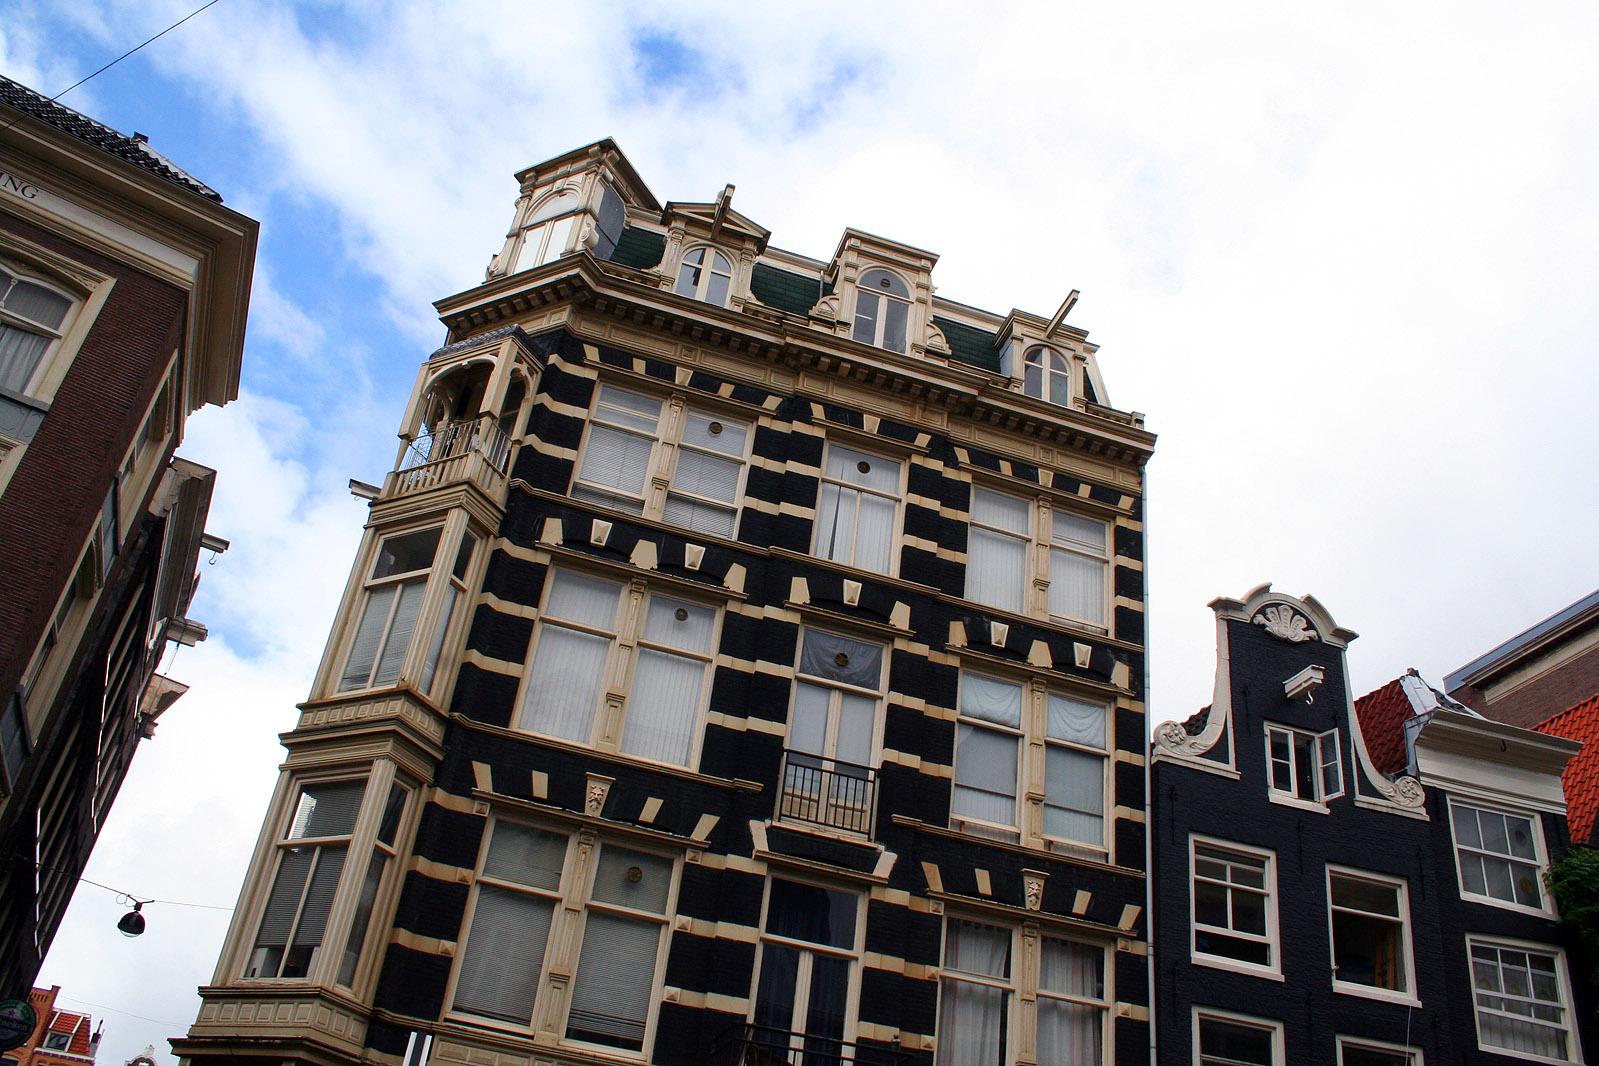 Looking upwards, Amsterdam, Dark, Day, Dutch, HQ Photo